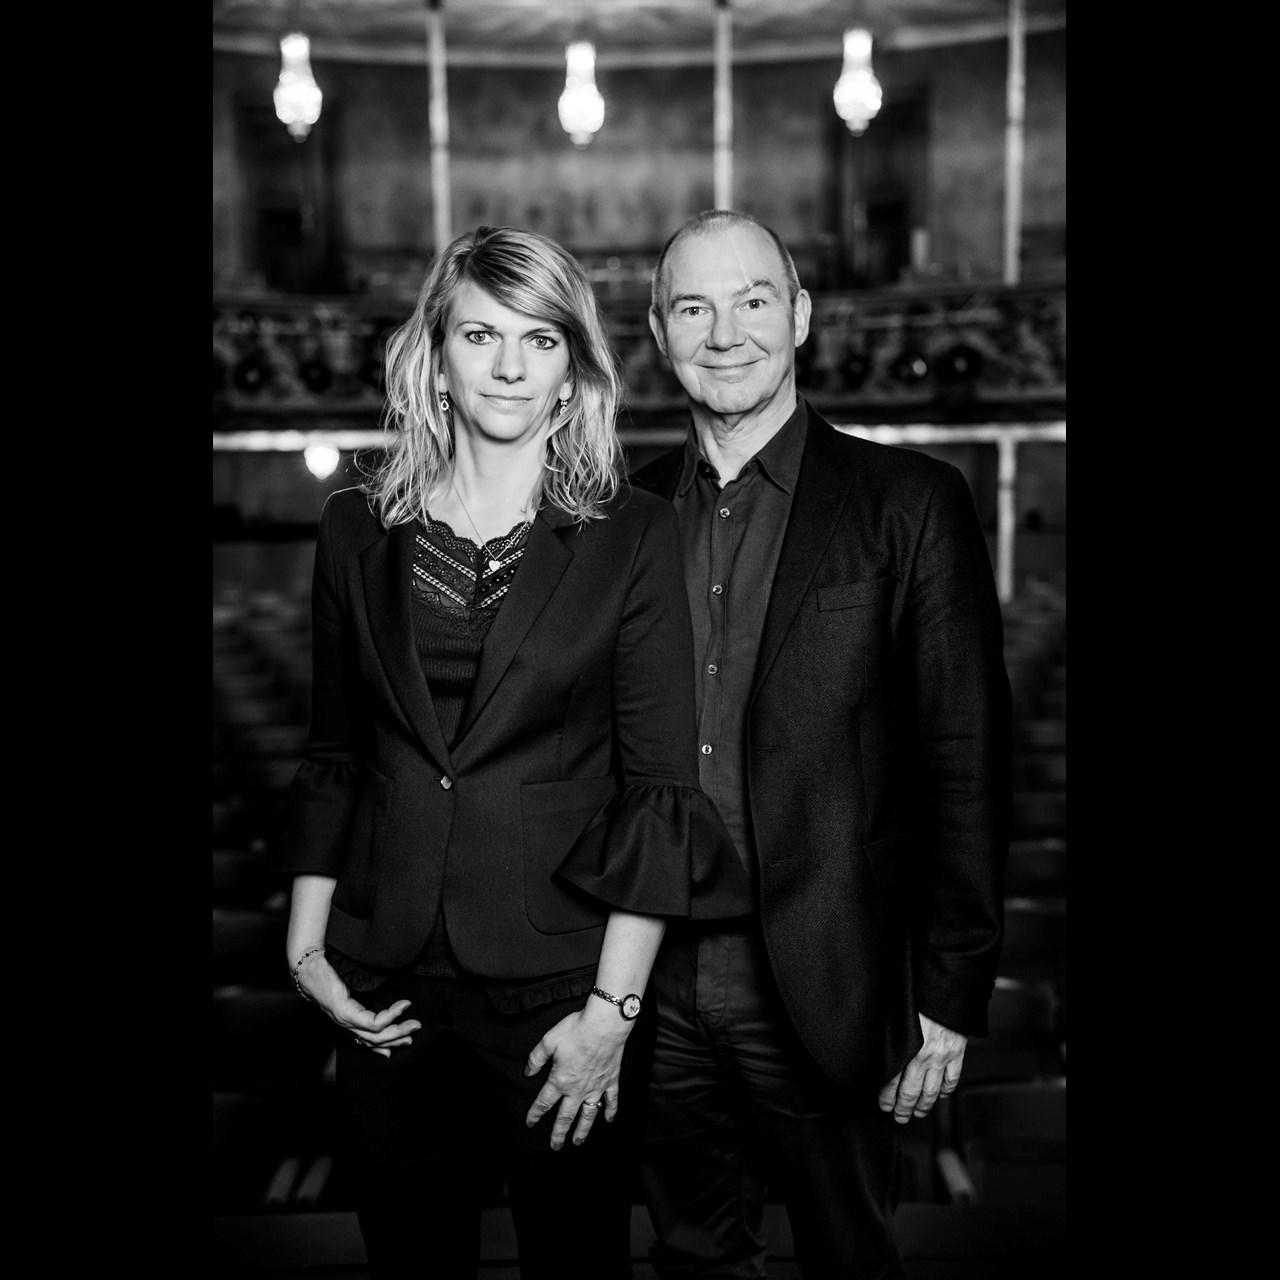 Direktør Allan Aagaard og Teaterdirektør Trine Holm Thomsen  Foto Isak Hoffmeyer